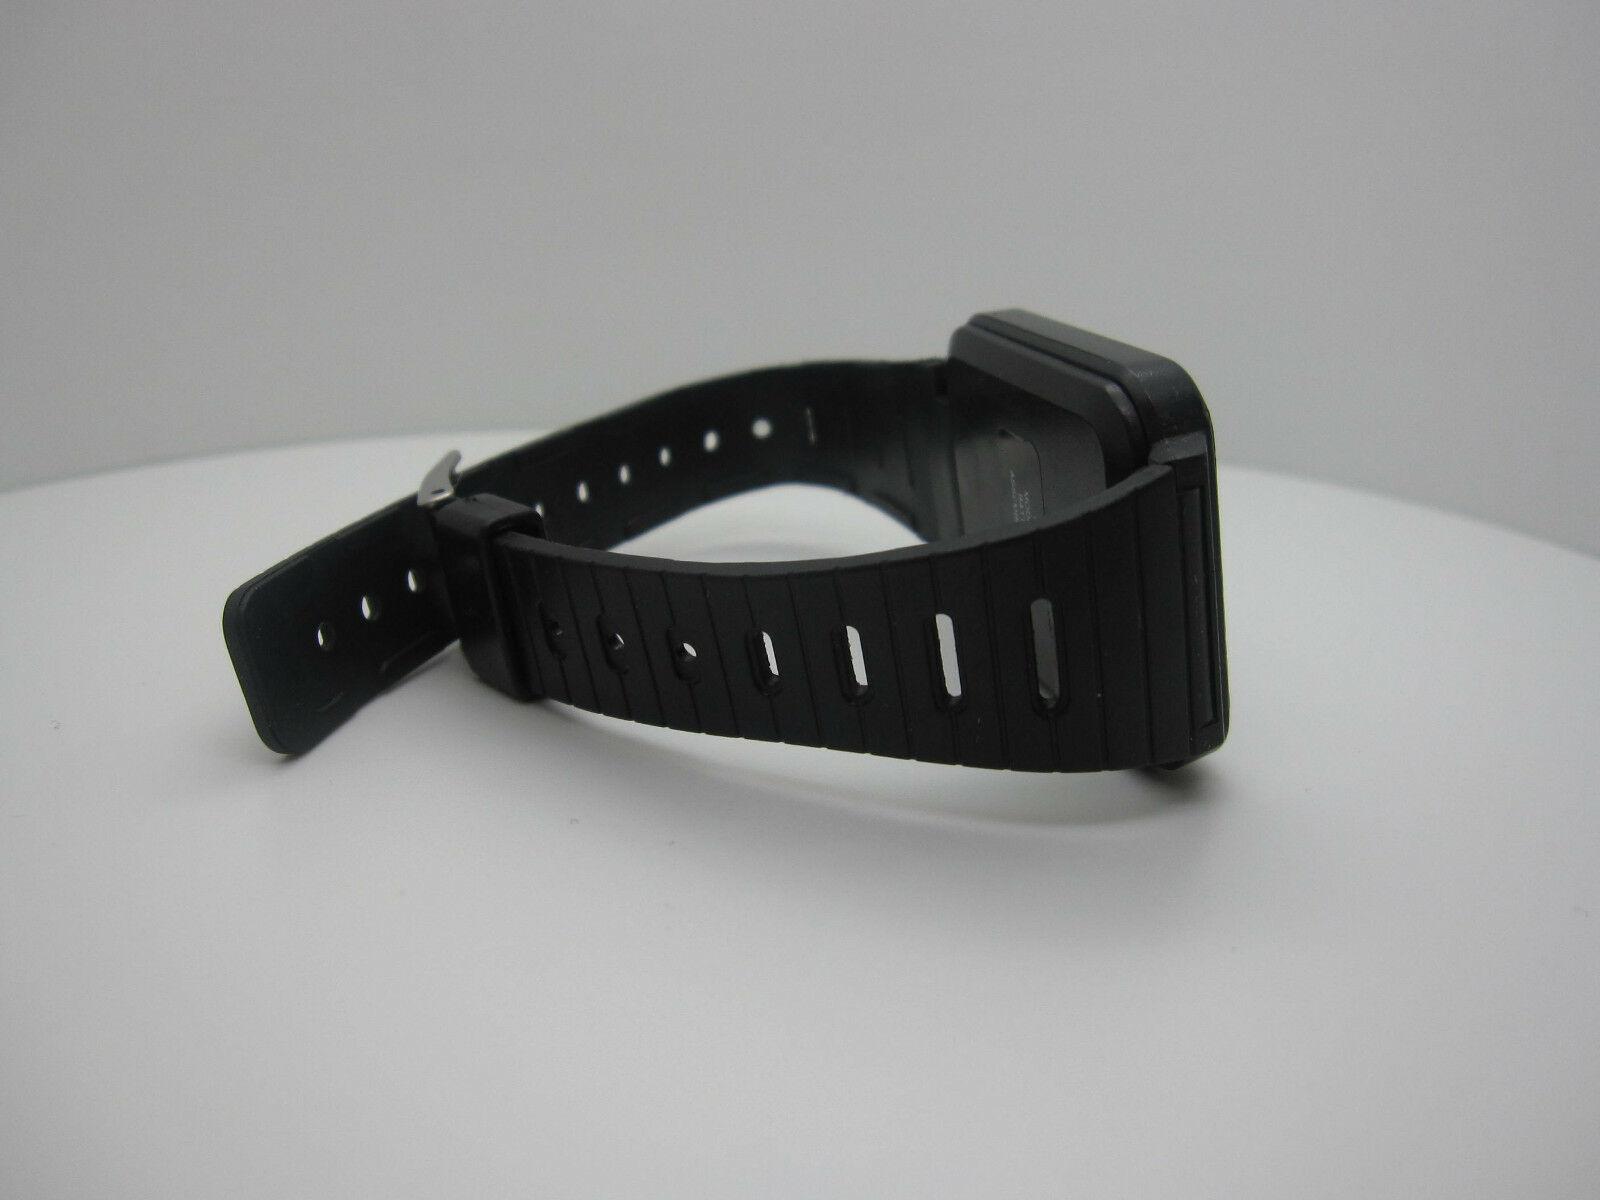 Vintage Sharp Chrono/Alarm/Chronograph Digital Watch